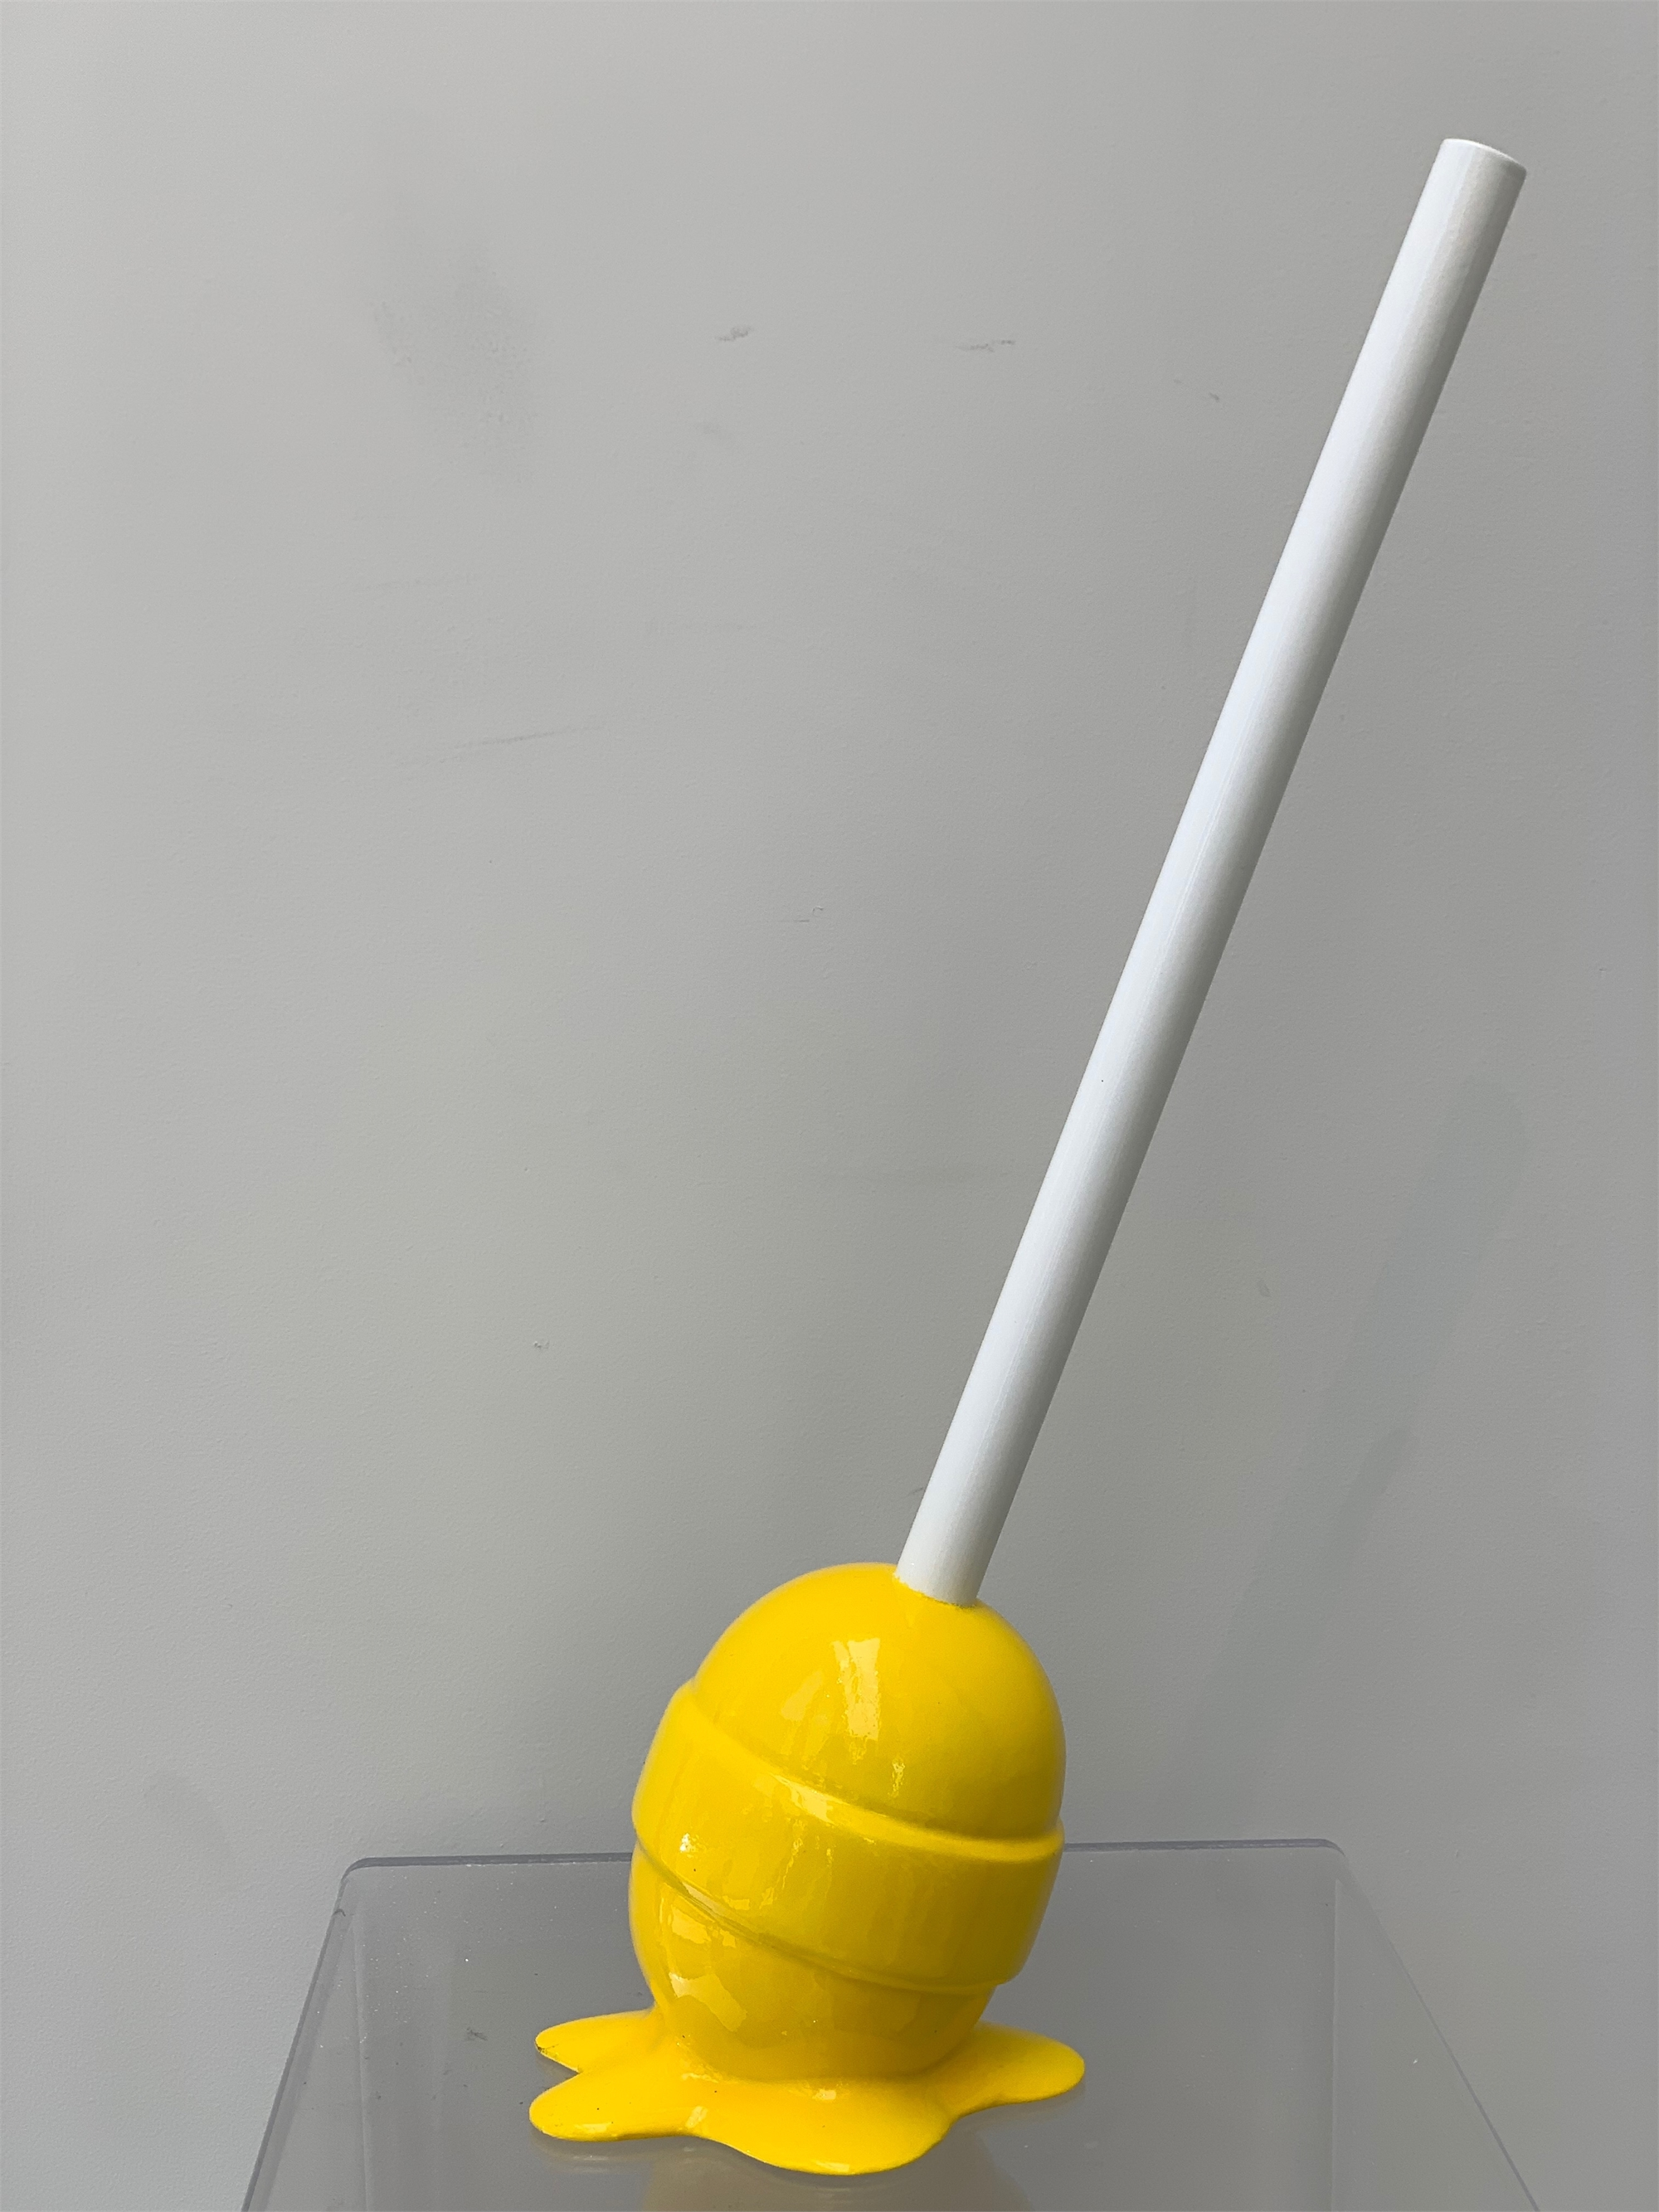 The Sweet Life Small Yellow Lollipop by Elena Bulatova